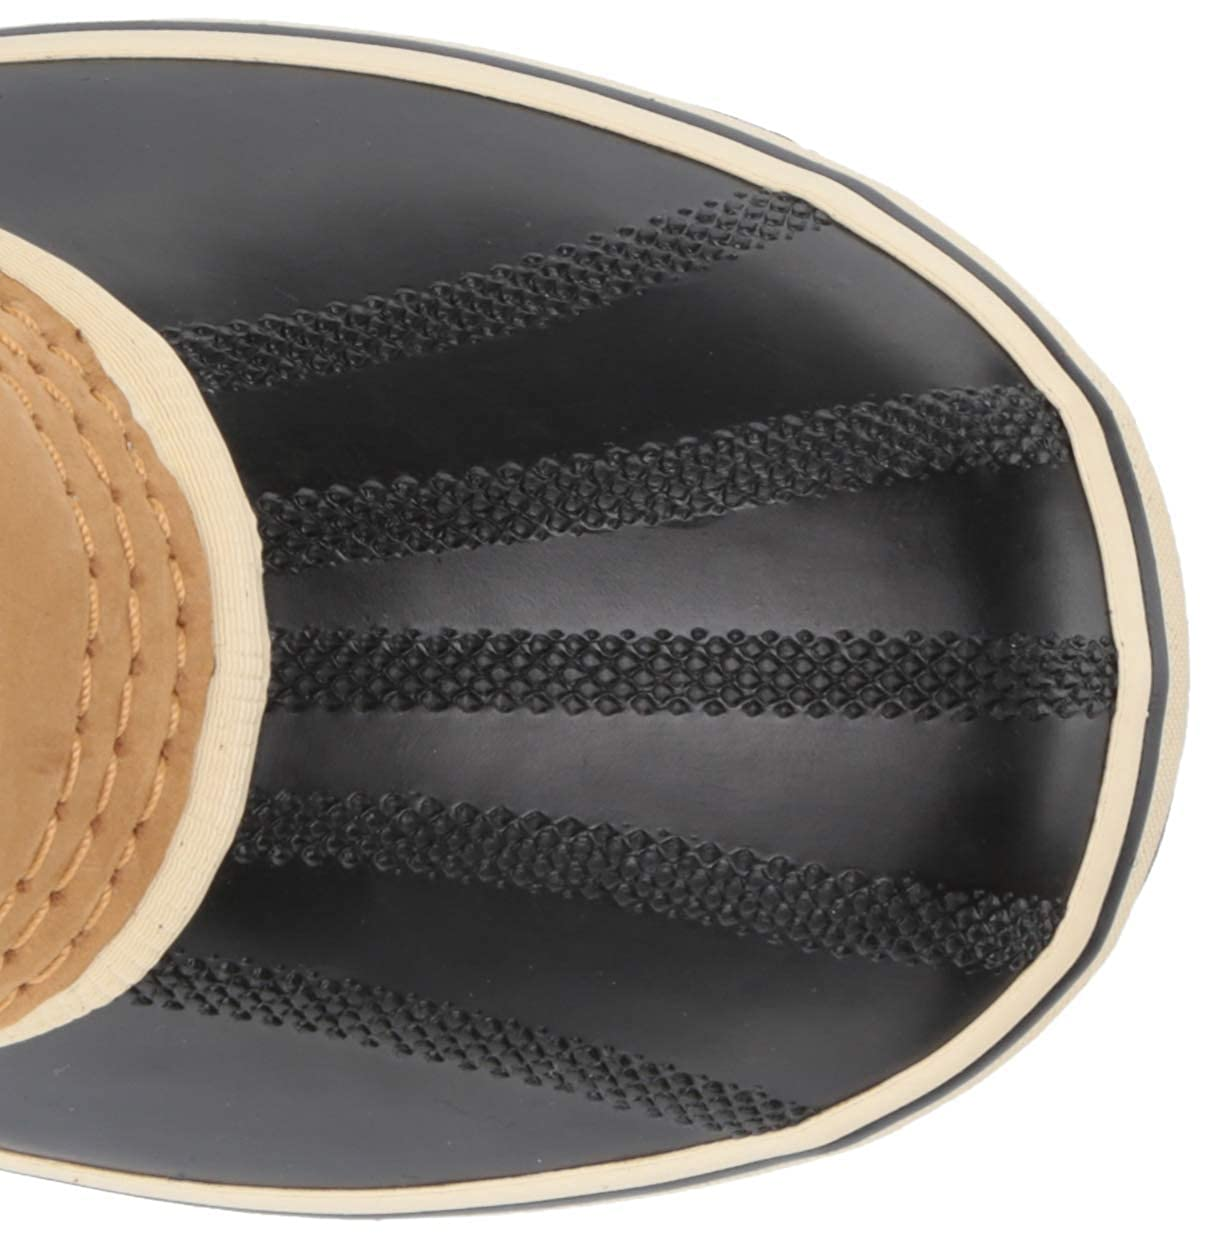 Sorel Womens 1964 PAC 2 Boots